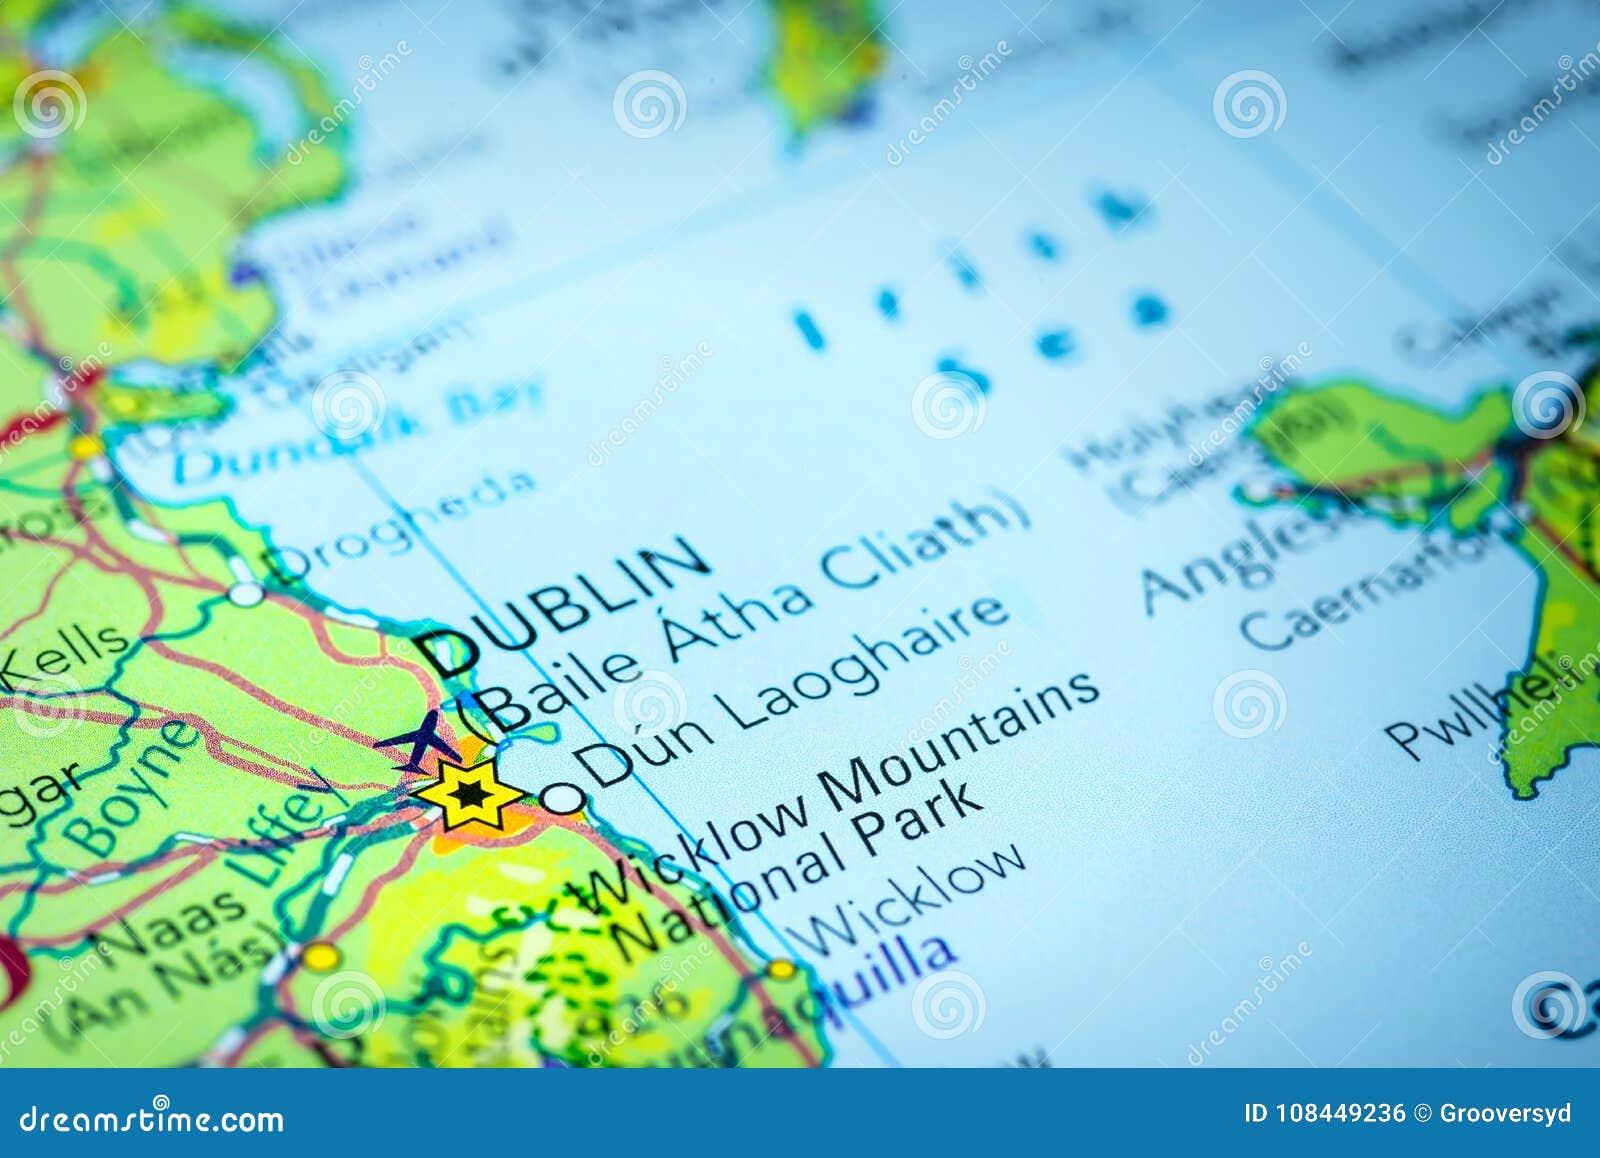 Dublín en Irlanda en un mapa